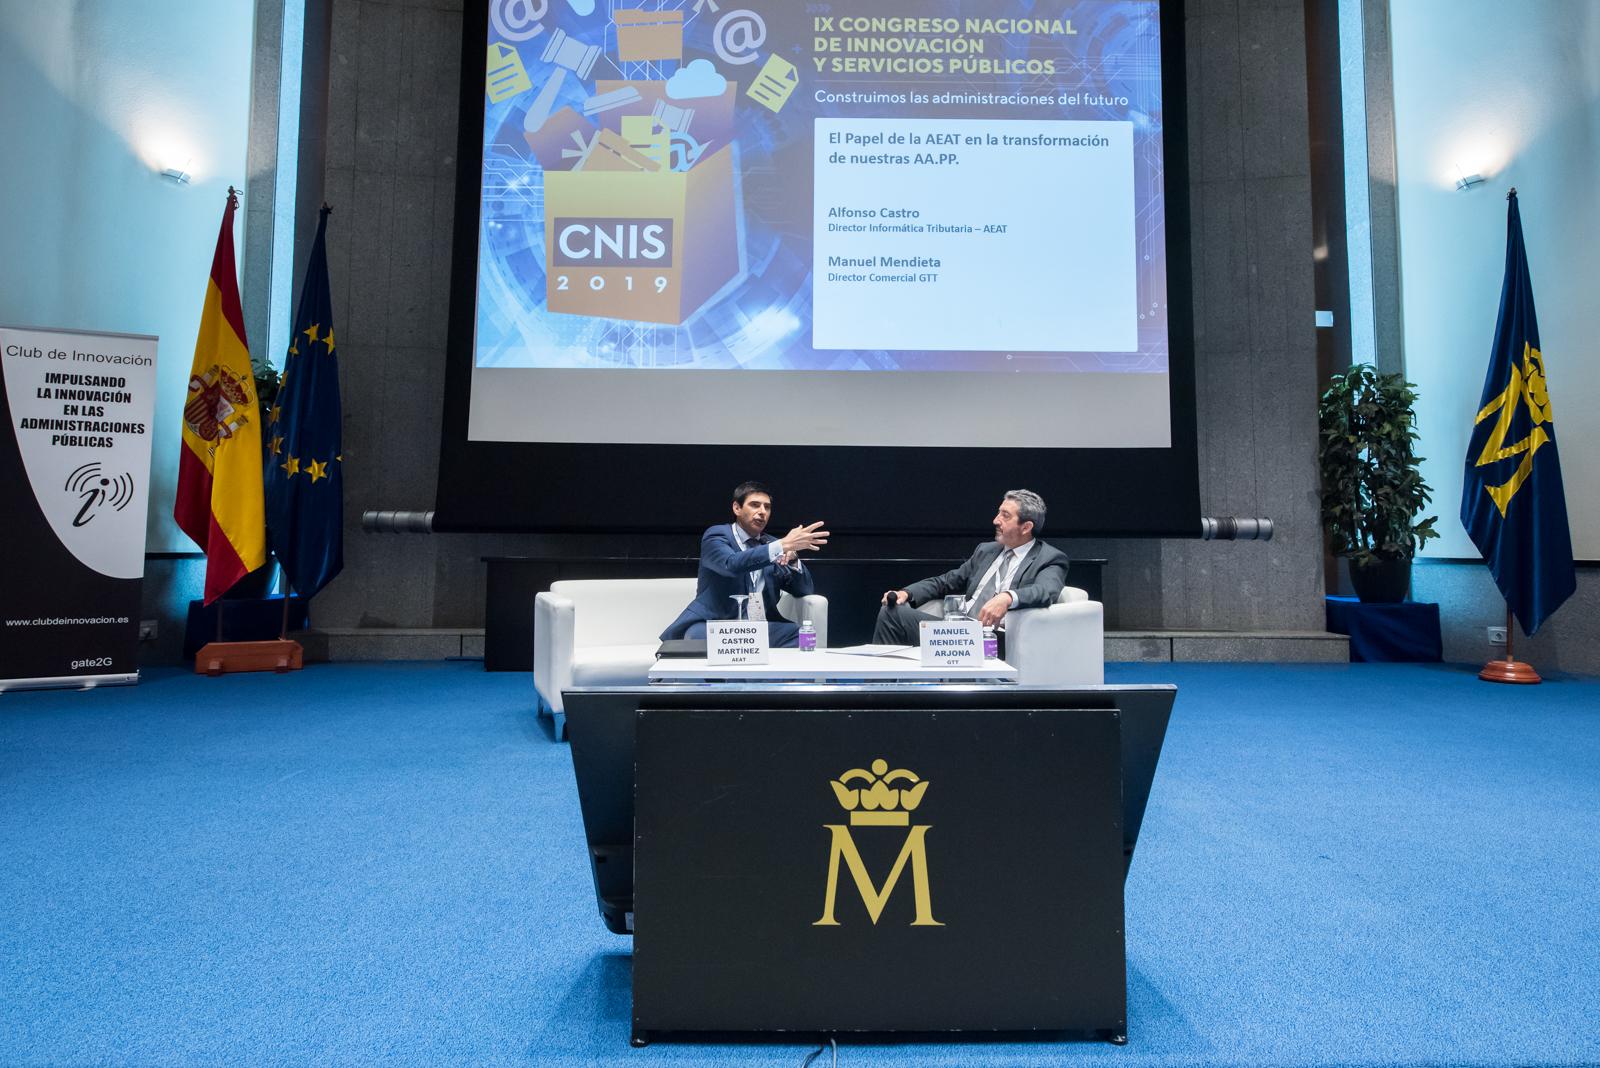 gtt, patrocinador Oro de CNIS 2019